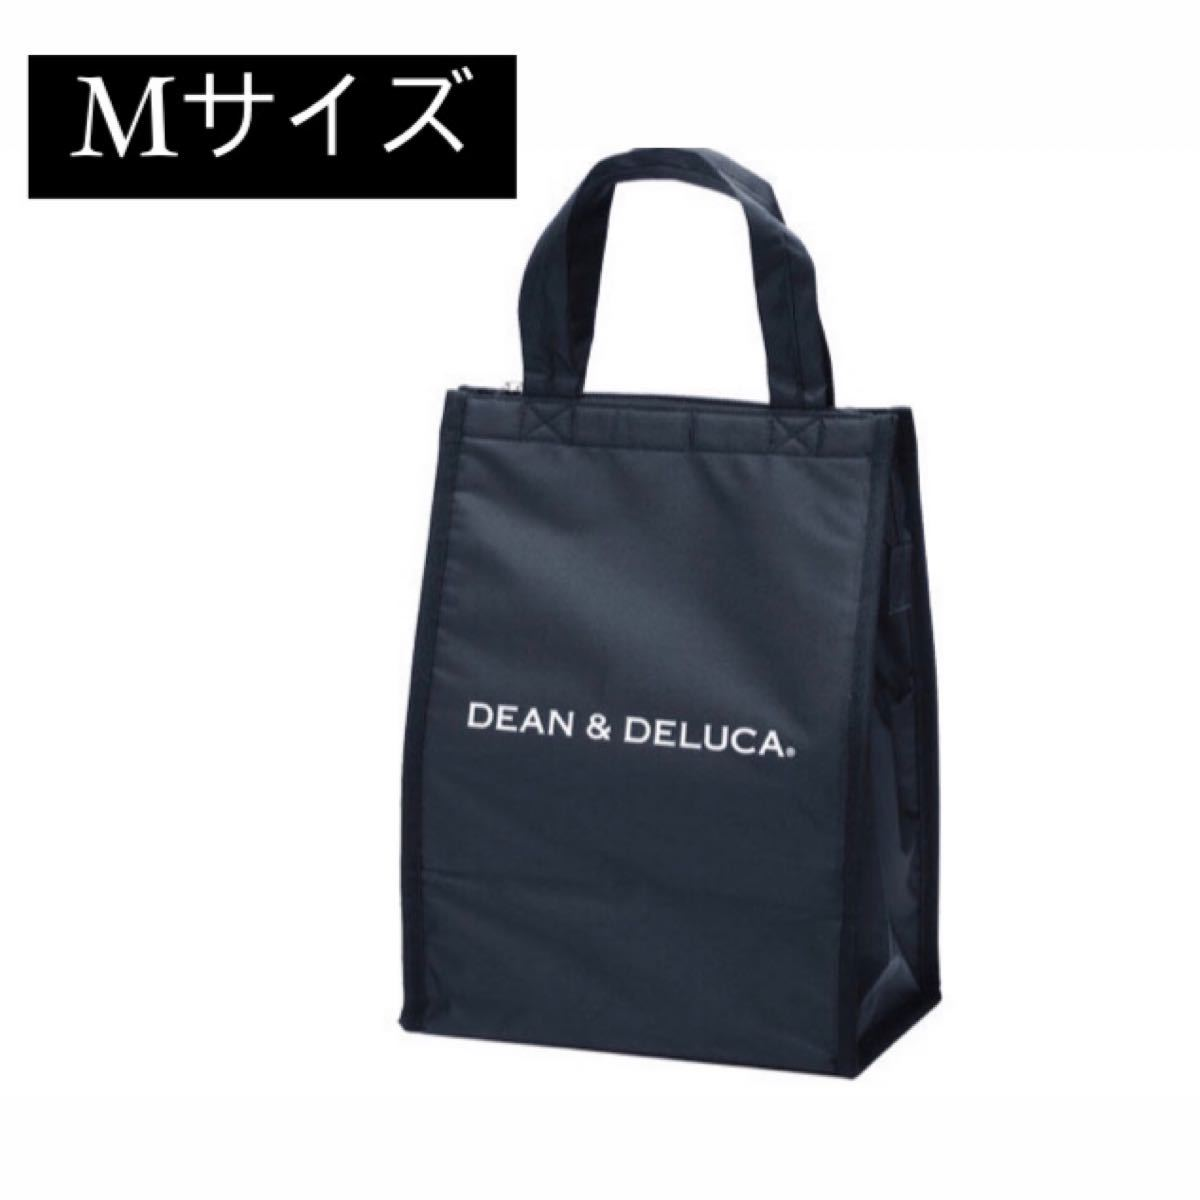 DEAN&DELUCA ディーン&デルーカ 保冷バッグ クーラーバッグ Mサイズ